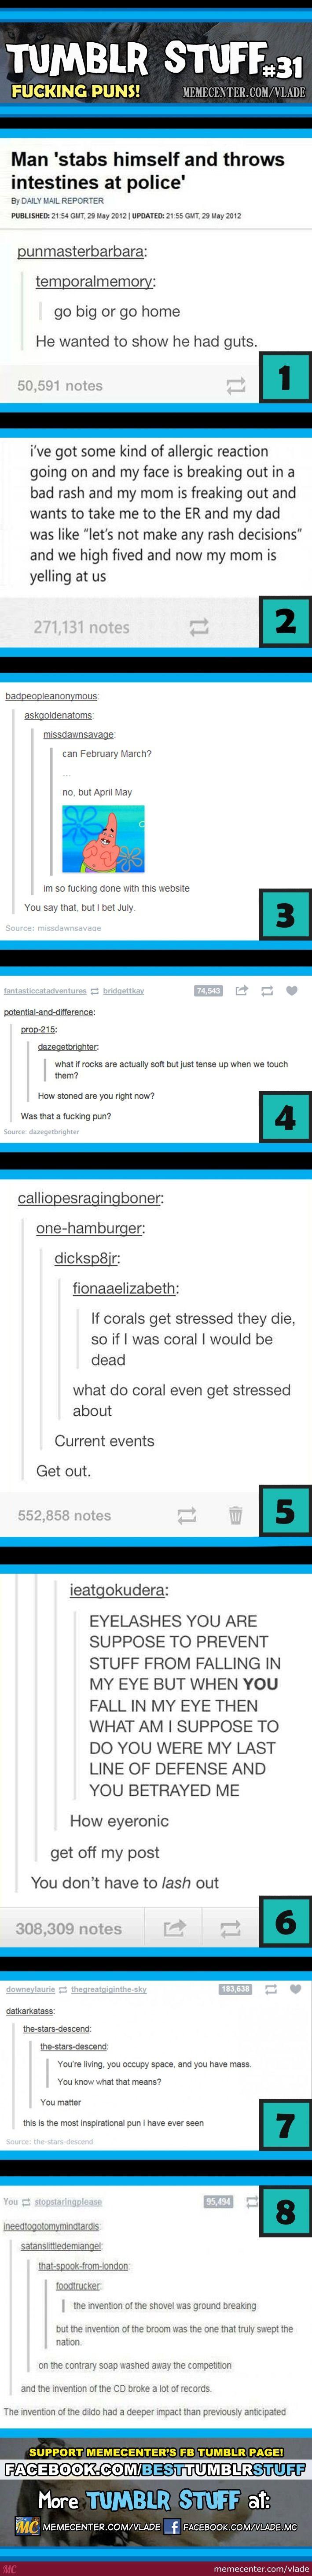 I love tumblr stuff!